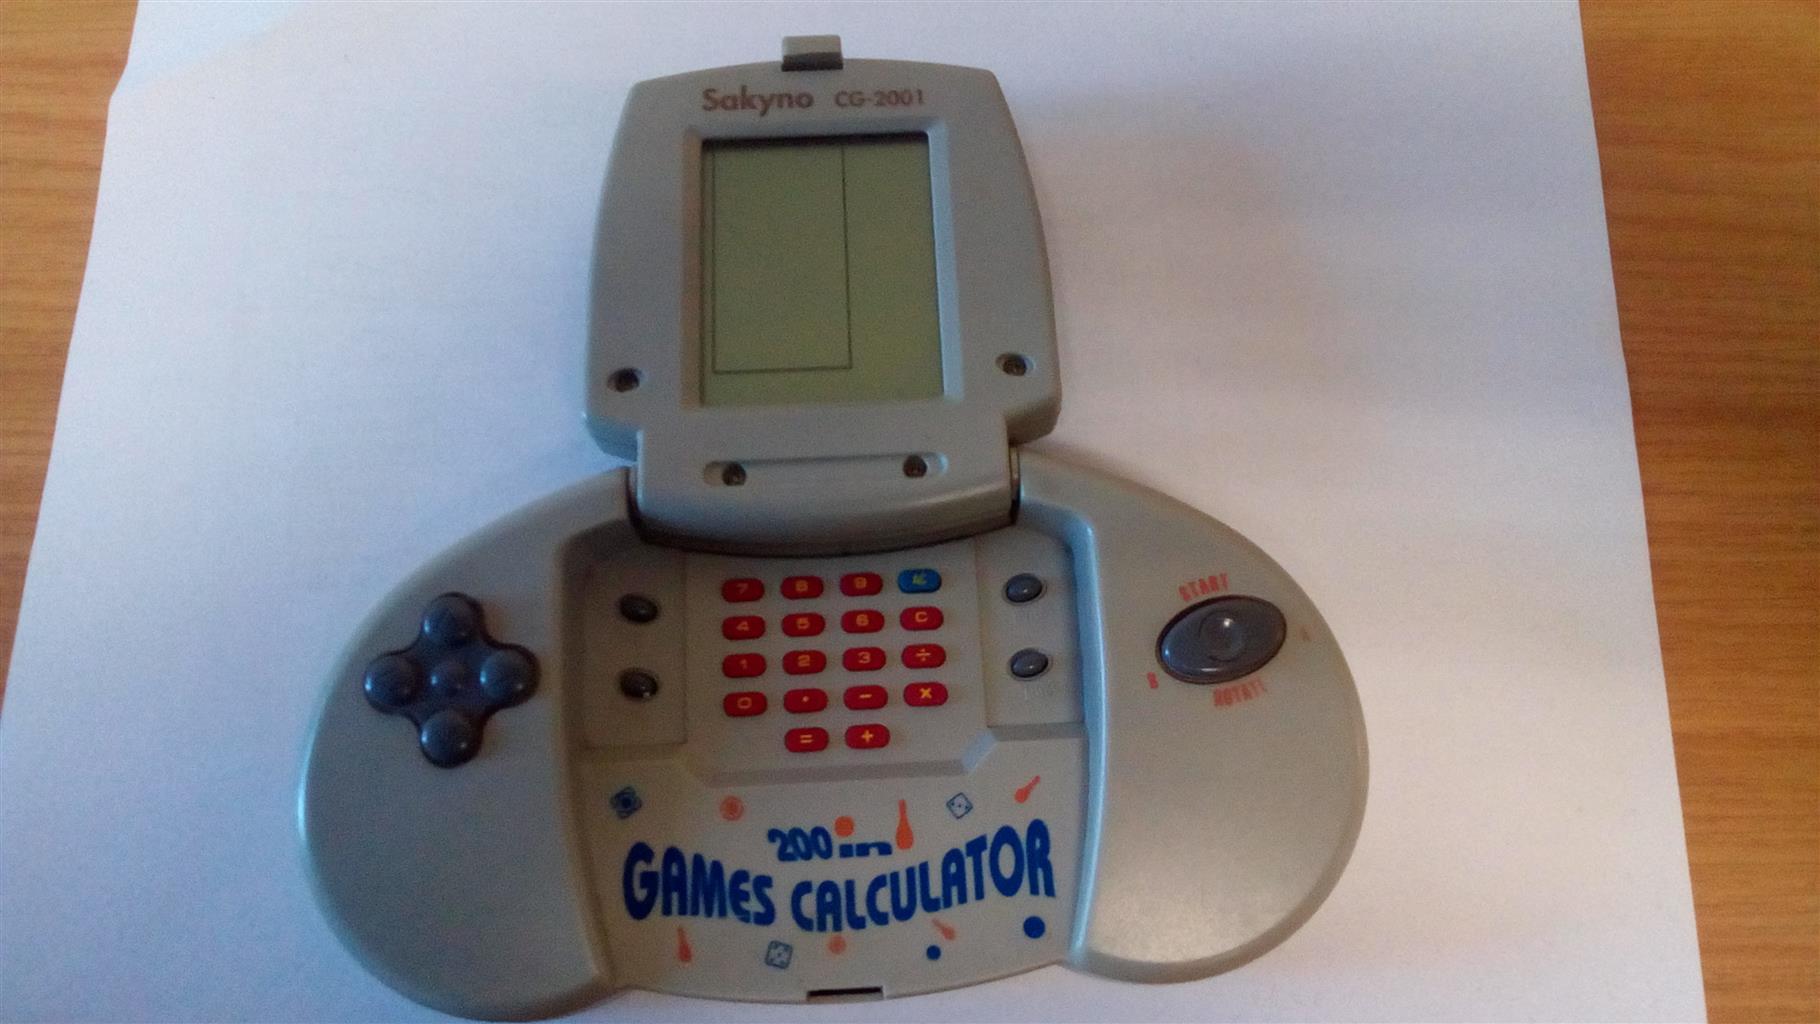 Sakyno CG-2001 200 in 1 Games and Calculator Handheld